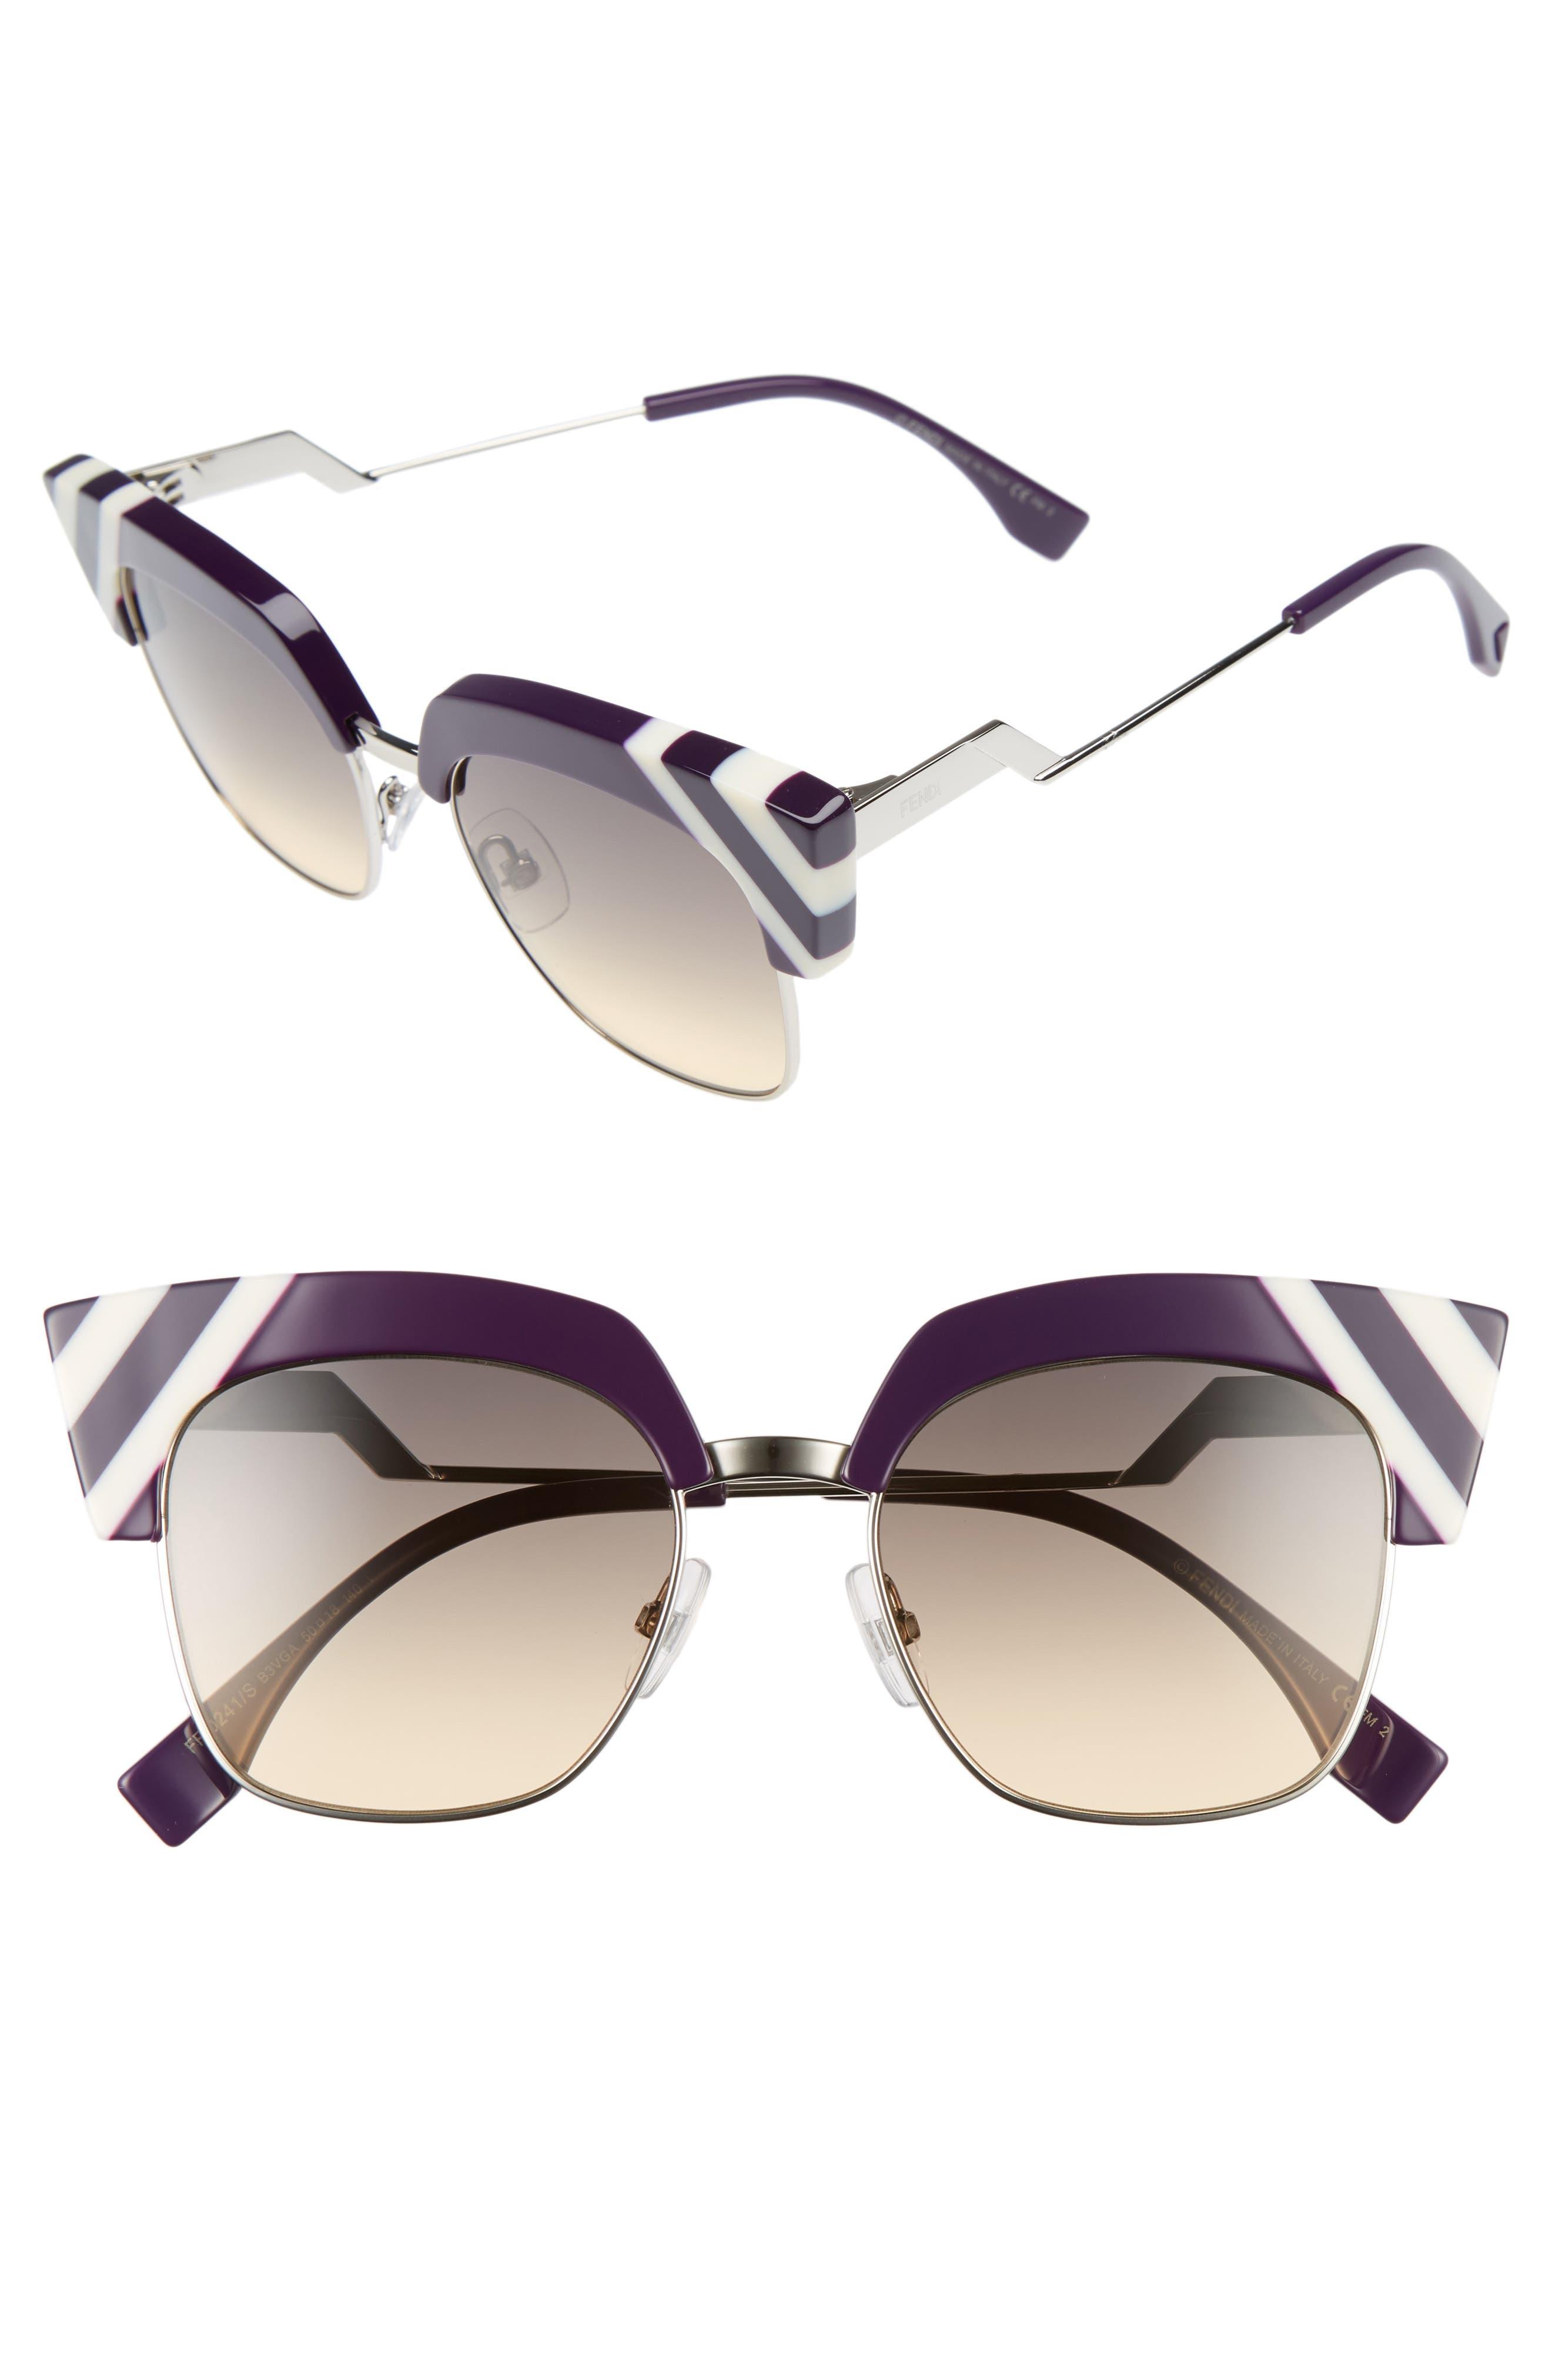 50mm Cat Eye Sunglasses,                         Main,                         color, Violet